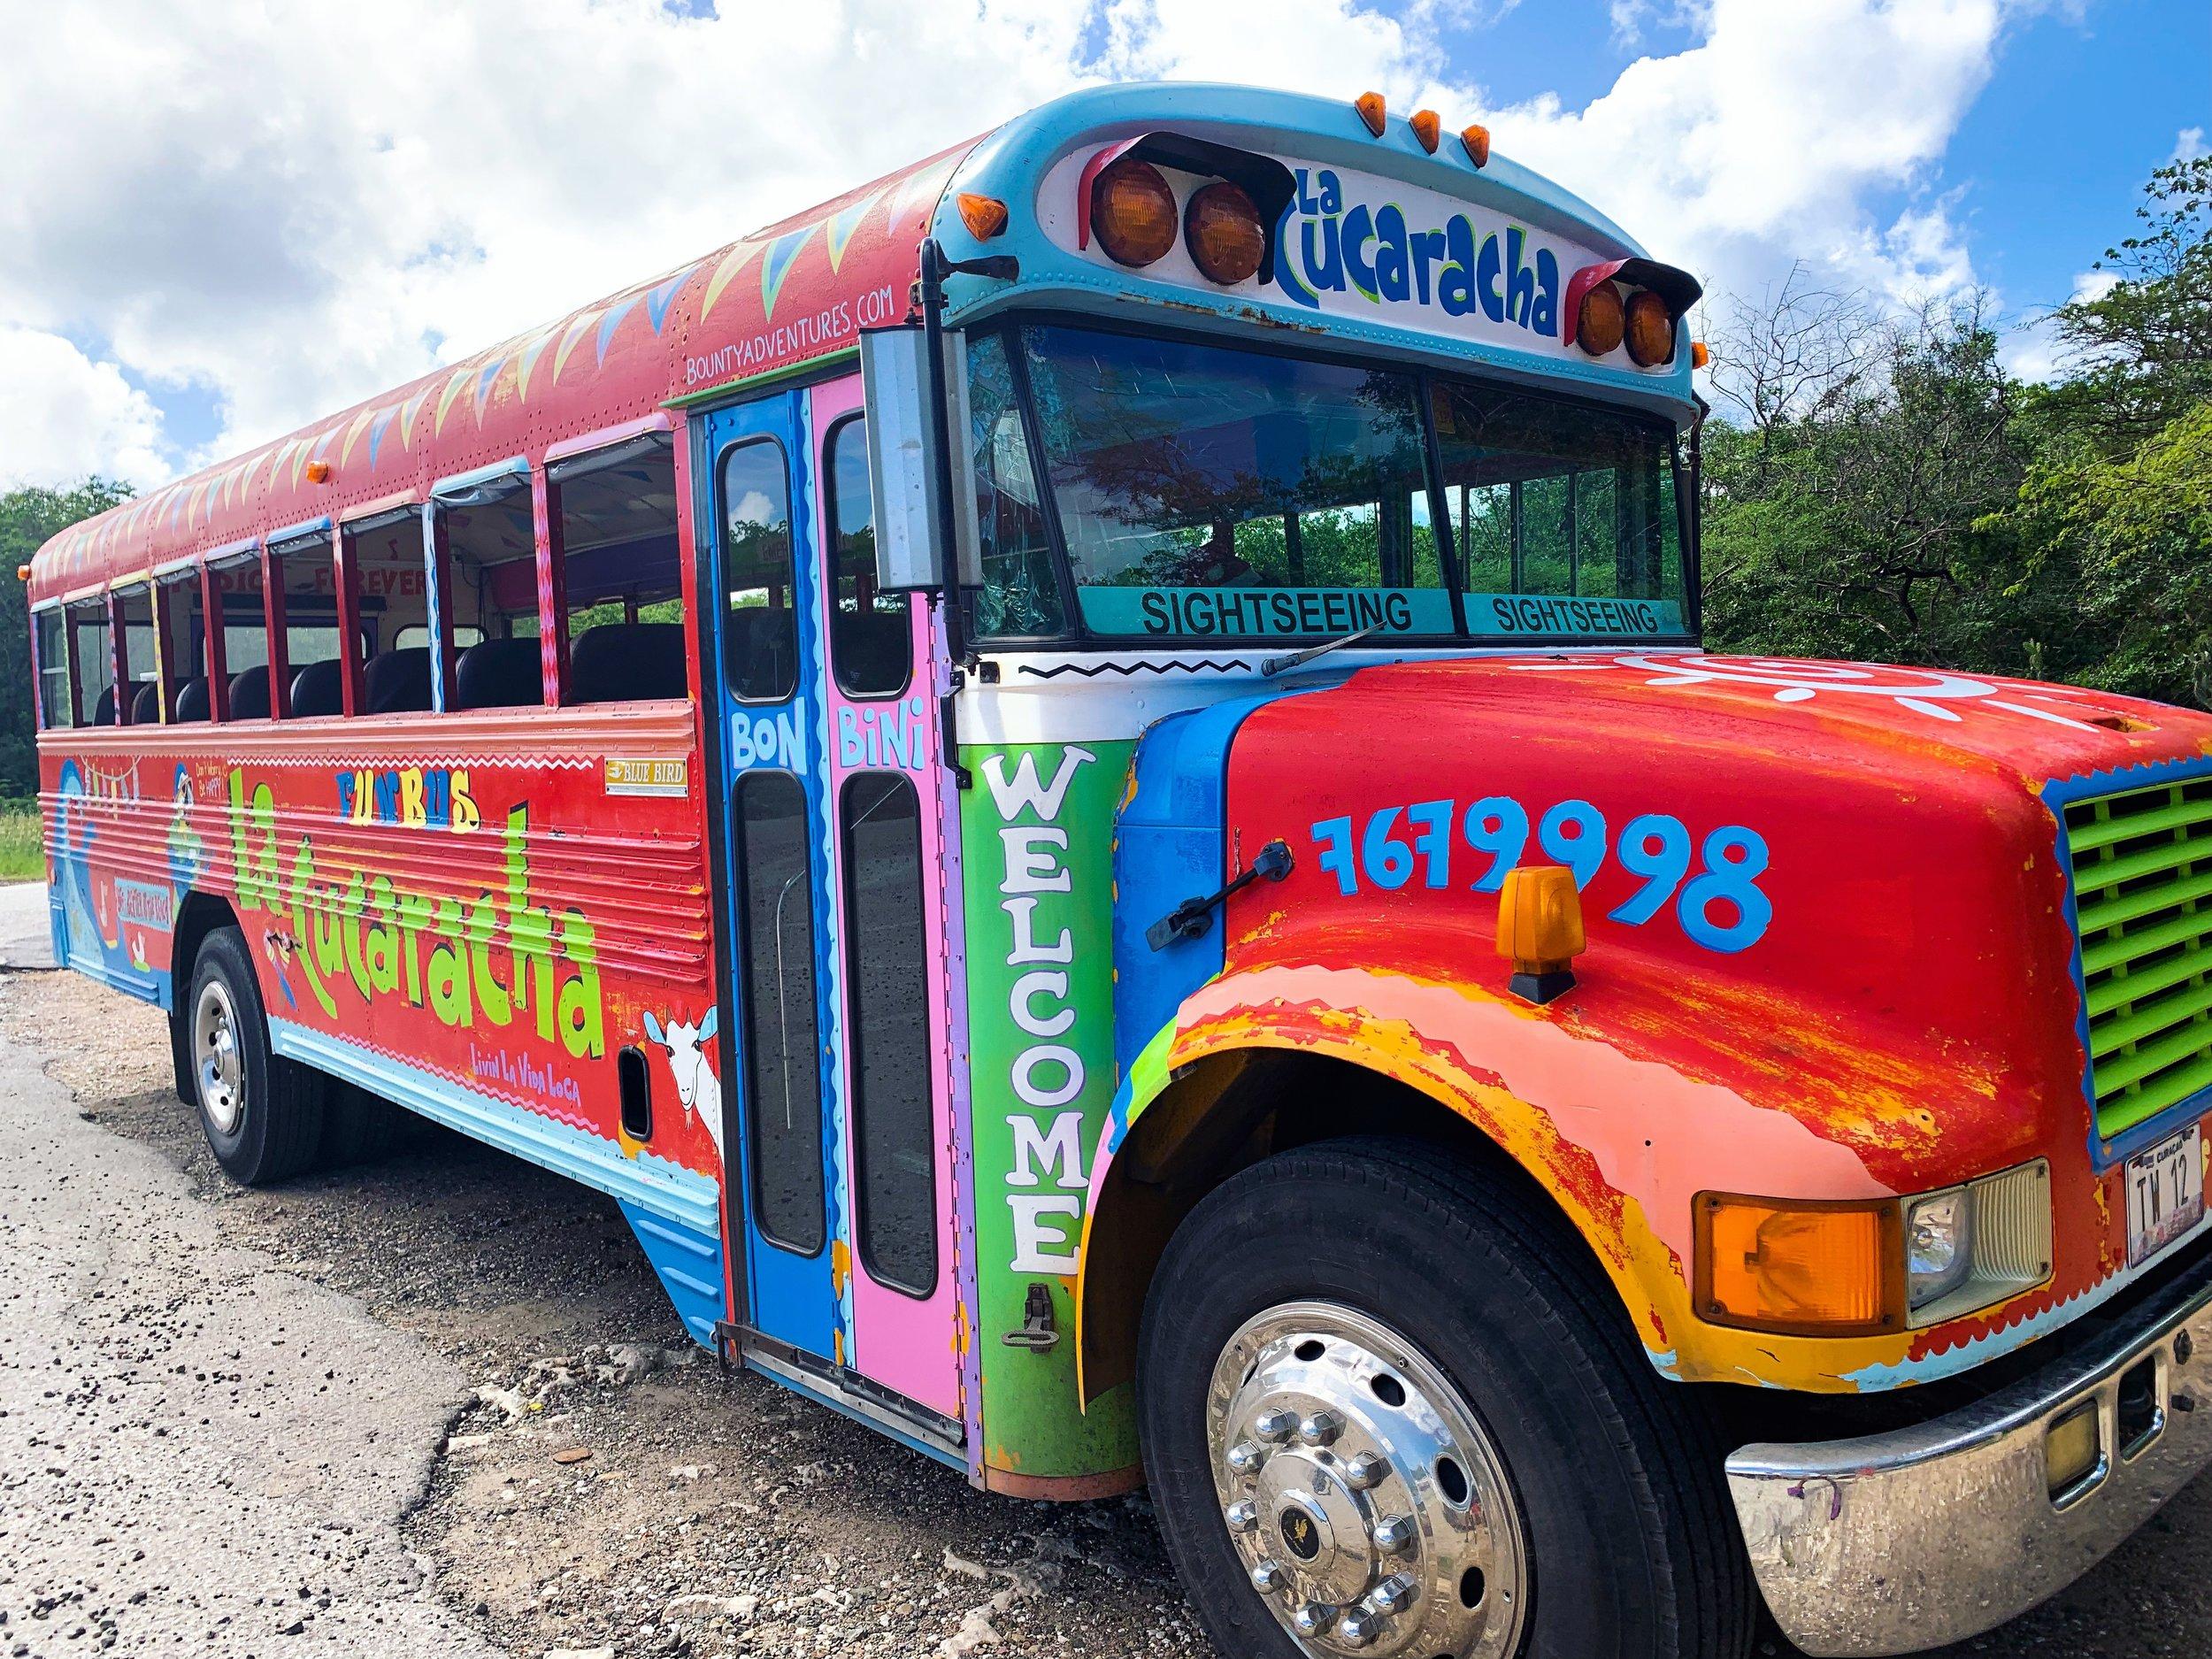 Curacao Transportation